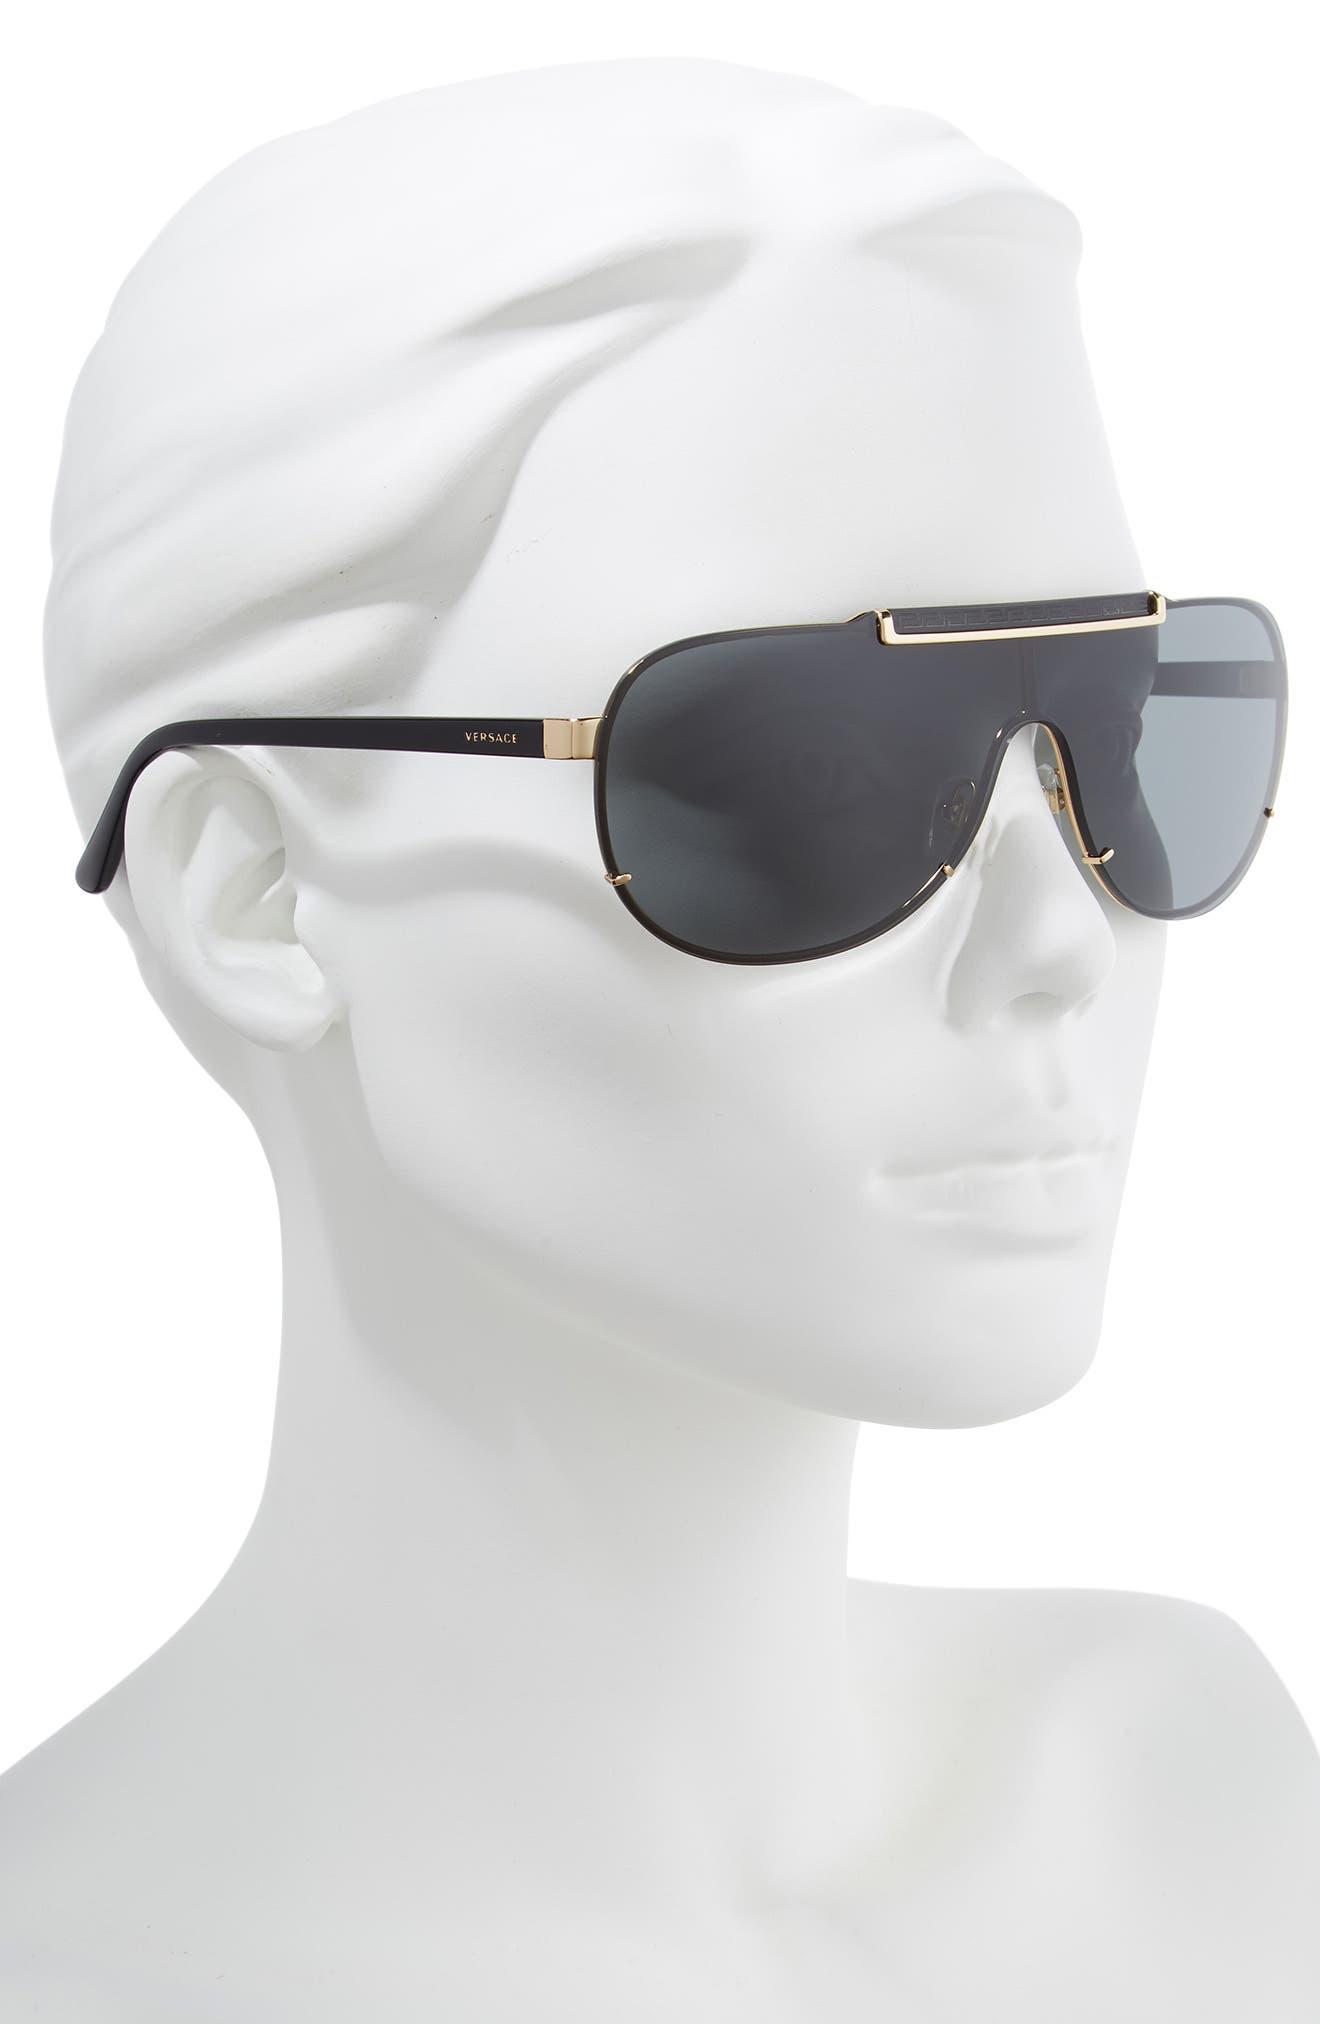 40mm Shield Sunglasses,                             Alternate thumbnail 2, color,                             007